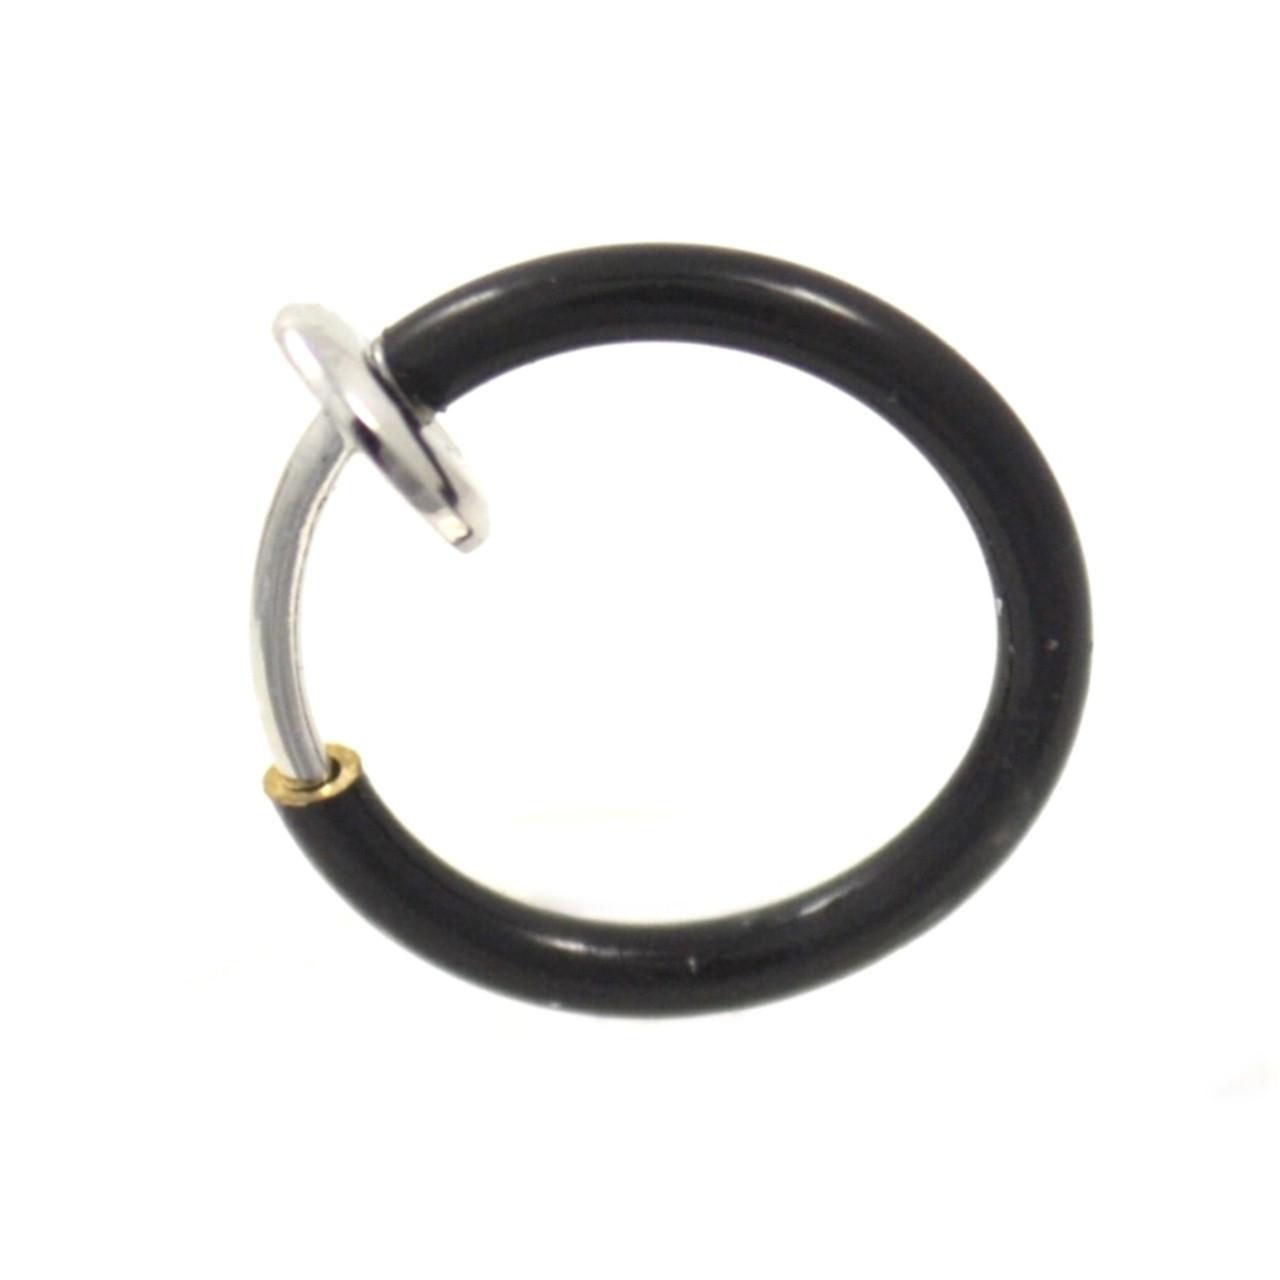 Black Titanium Snap On Fake Septum Piercing Hoop Bodydazz Com